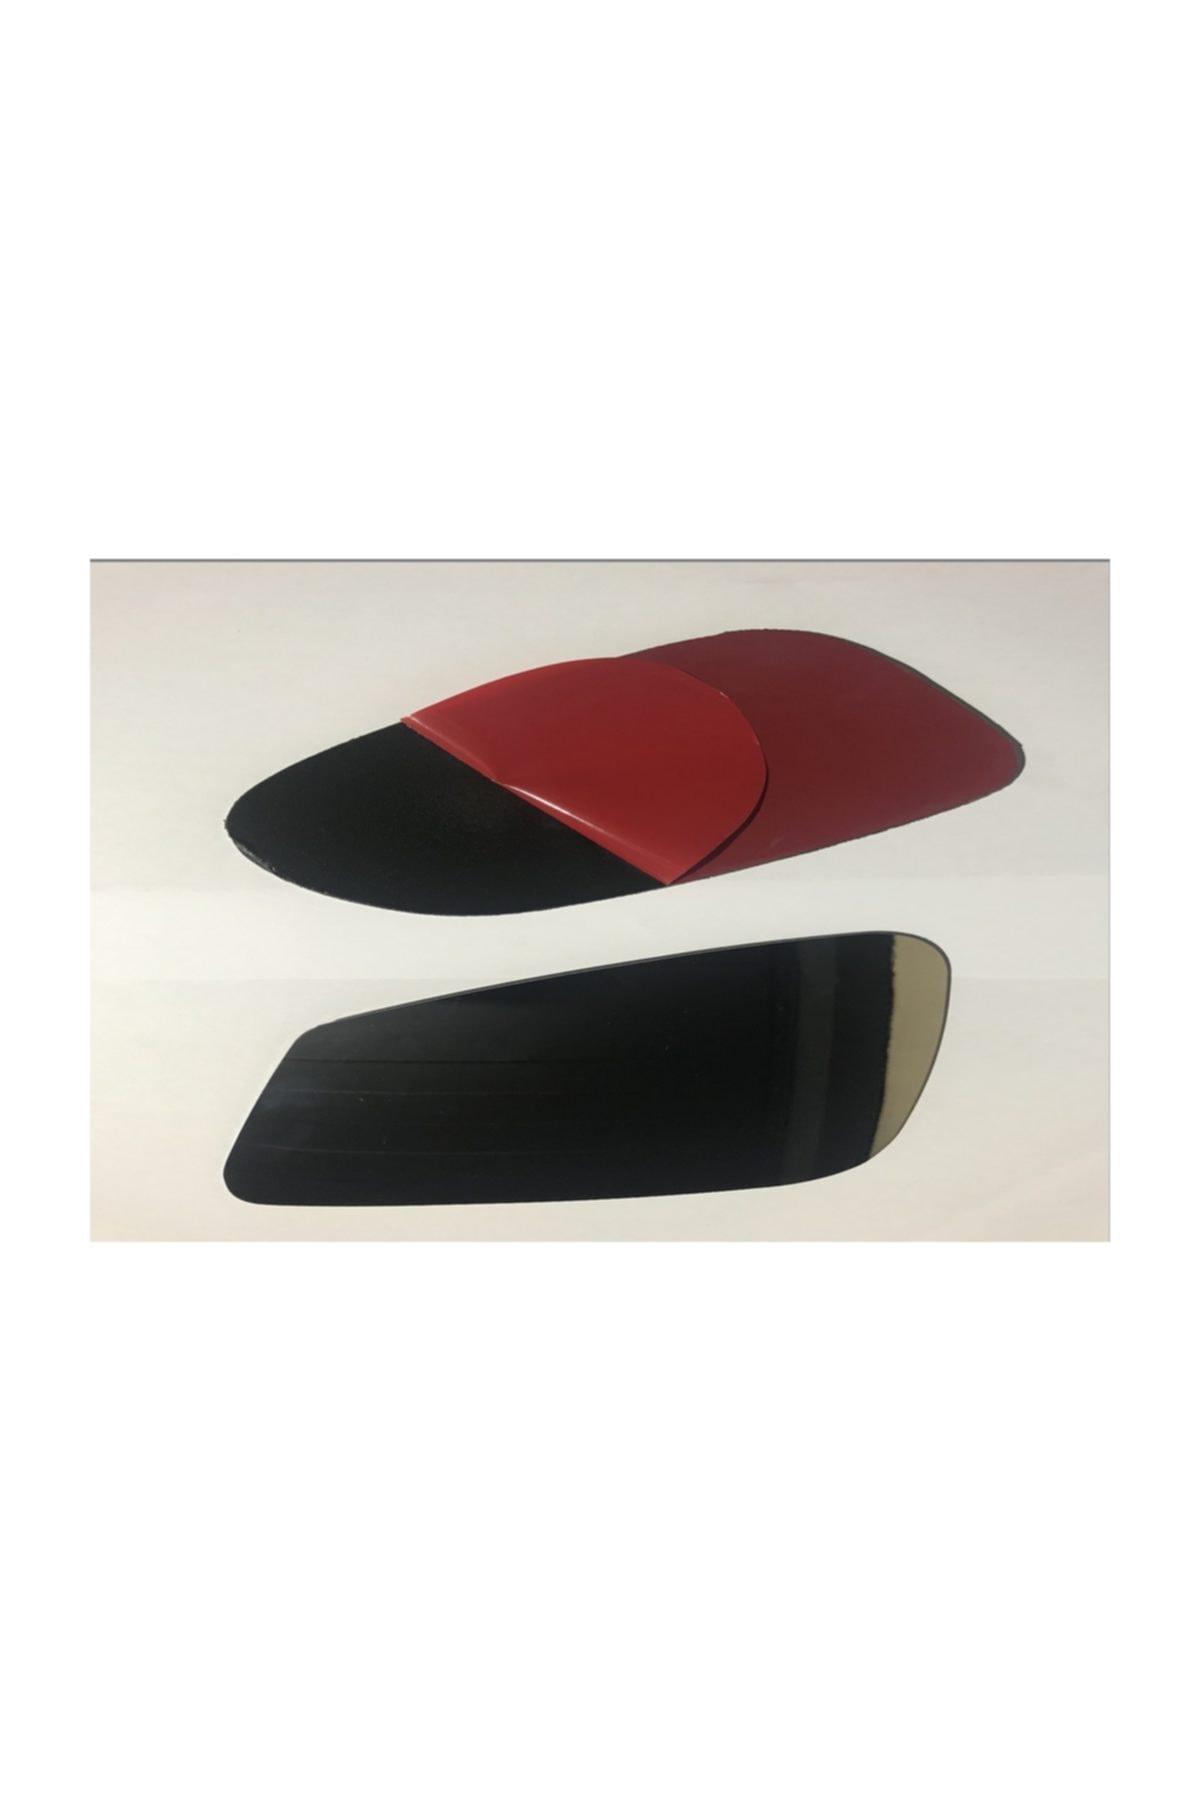 AKAYNA Opel Corsa B Sol Ayna Camı 1